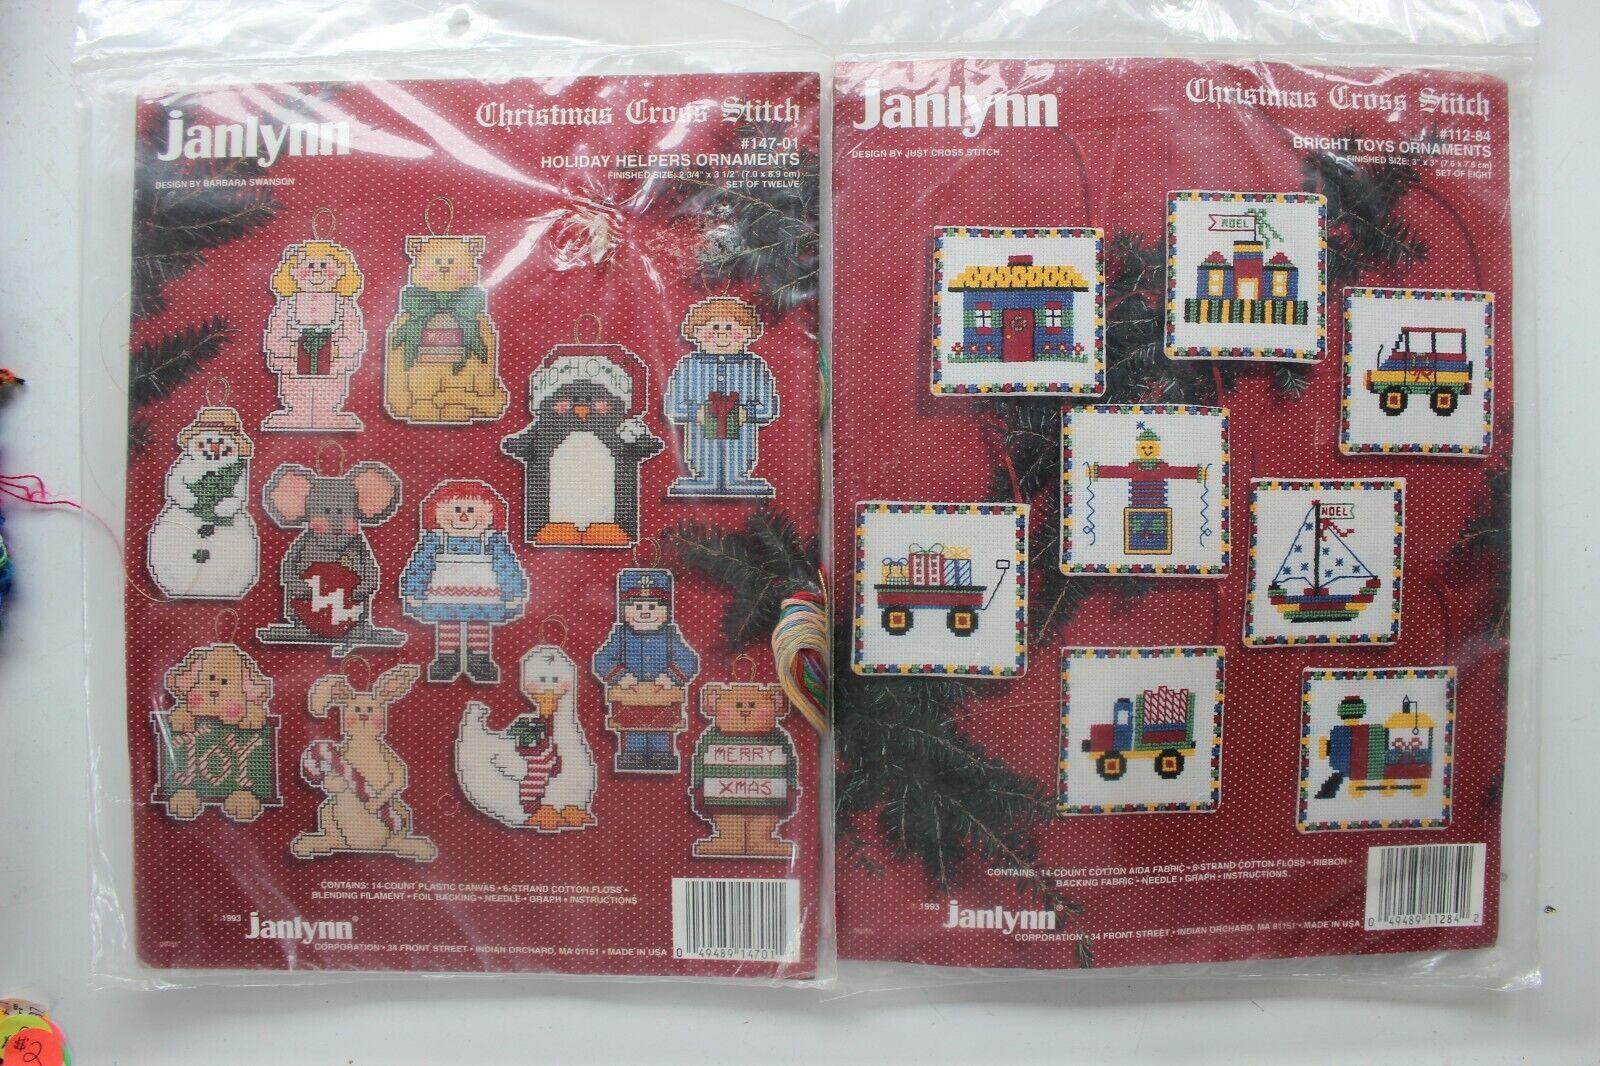 2 Janlynn Christmas Cross Stitch Ornament Kits.. Holiday Hel